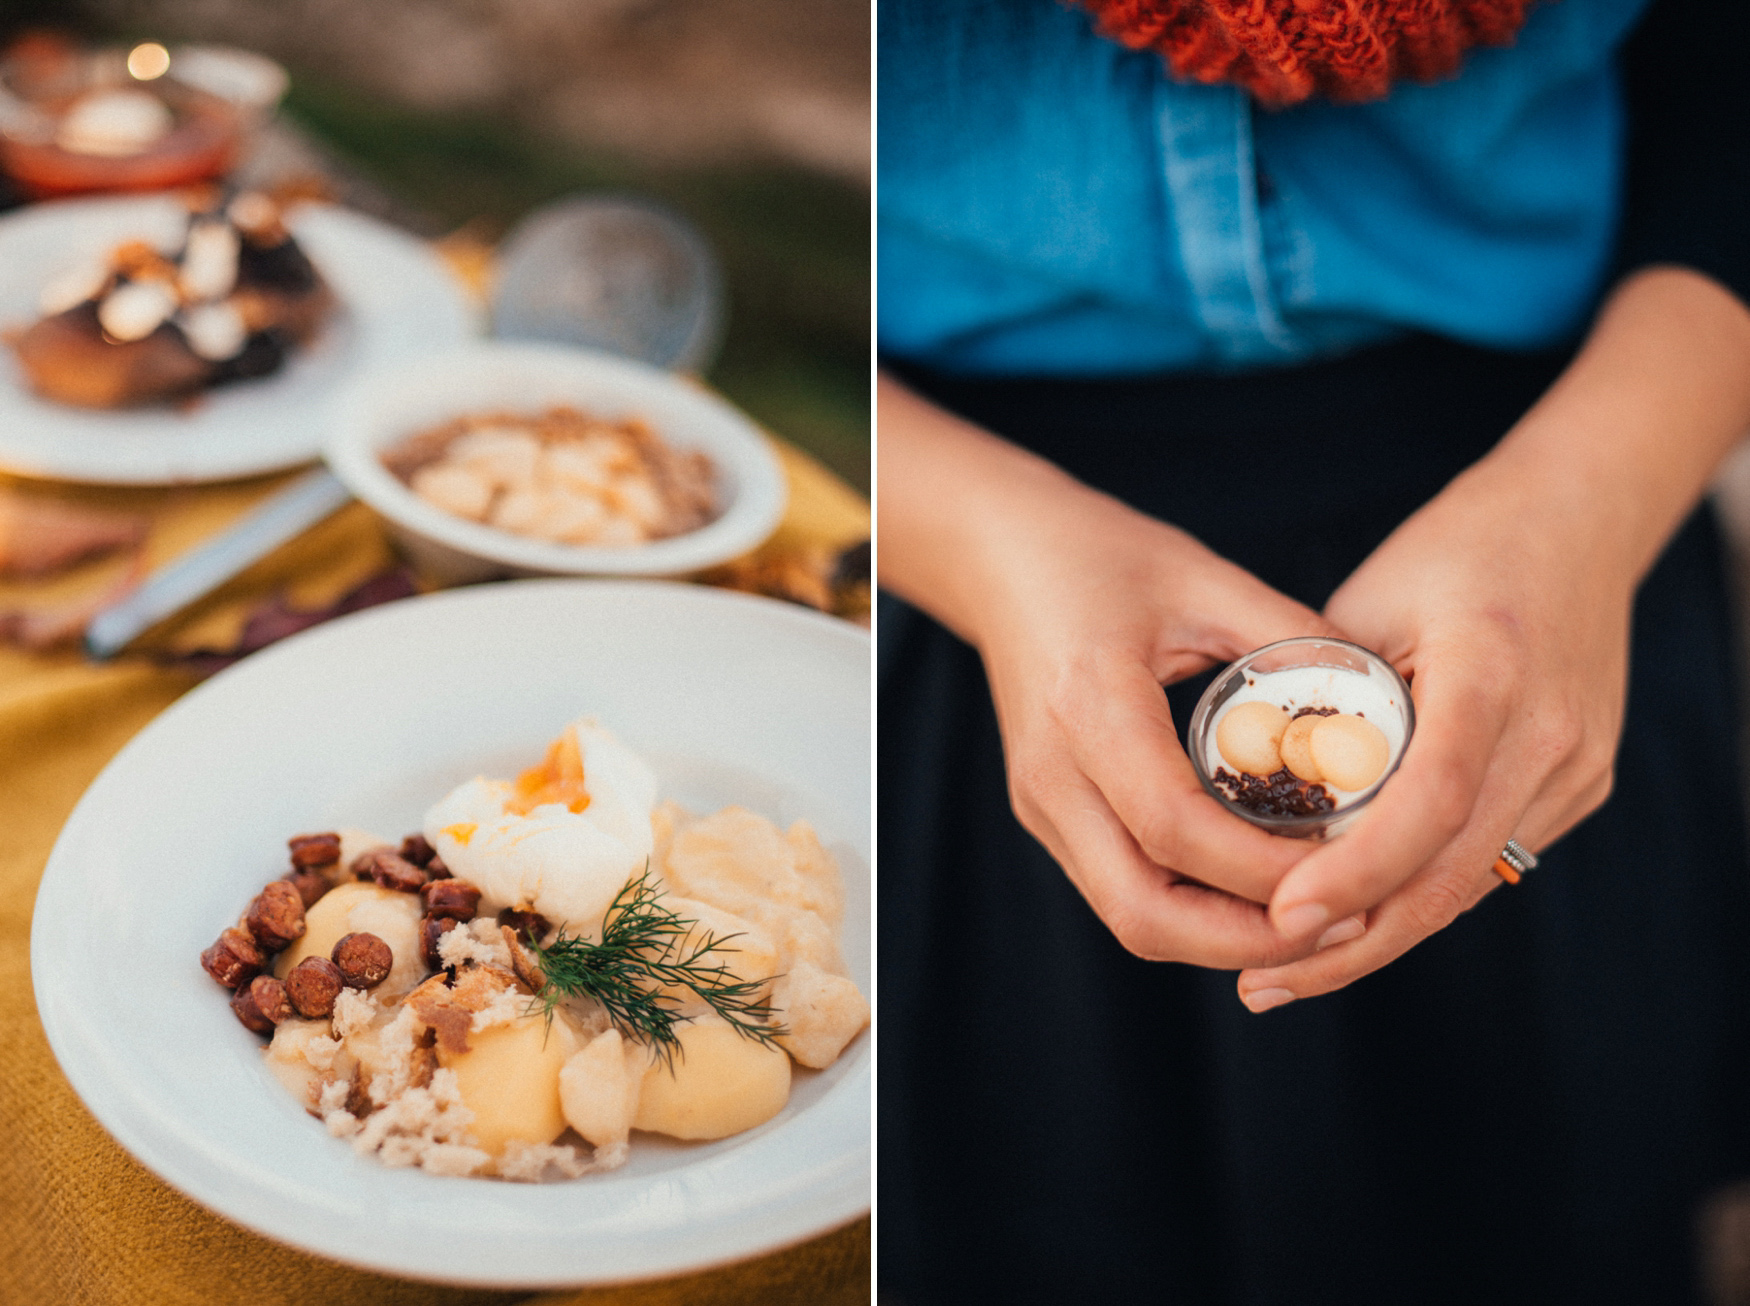 foodblog lifestyle photographer zufana 015.jpg